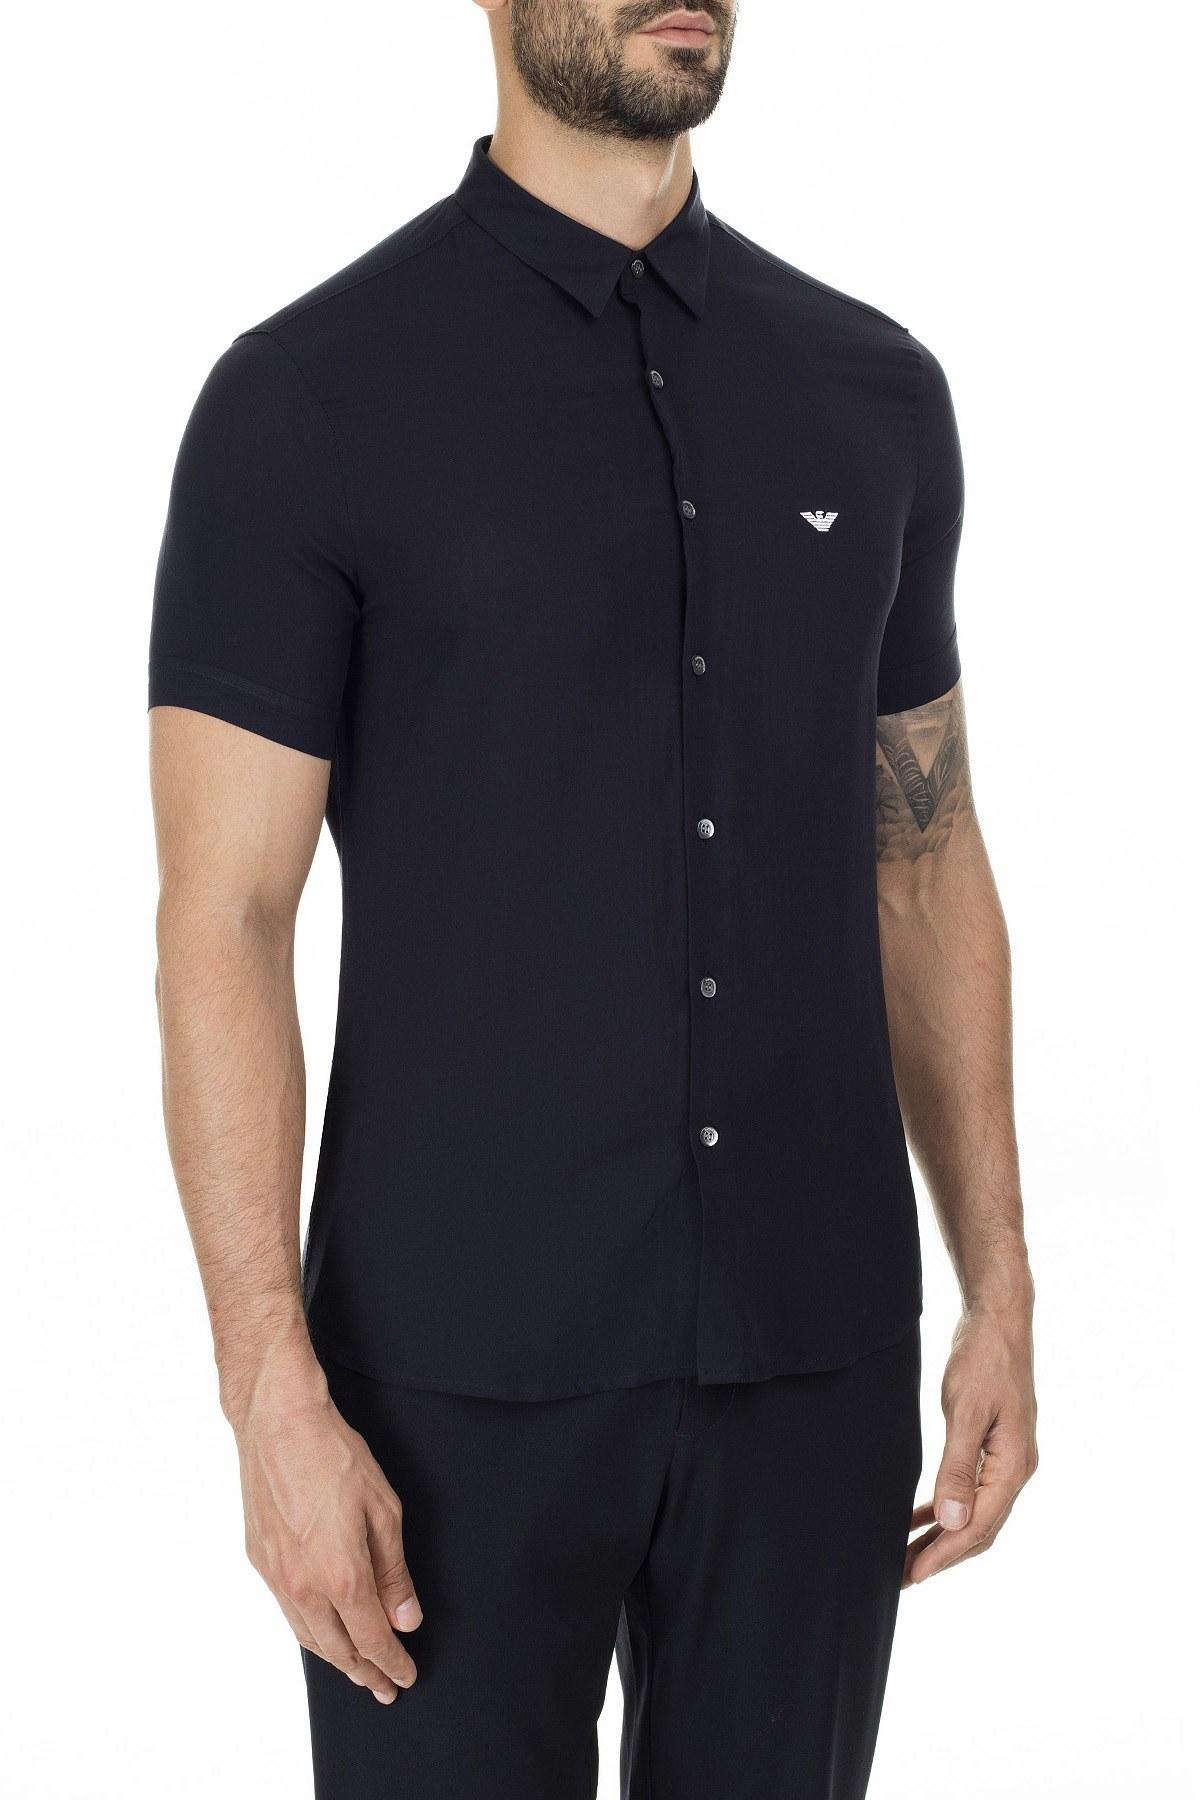 Emporio Armani Slim Fit Düz Yaka Erkek Gömlek 3H1C91 1NXKZ 0922 LACİVERT